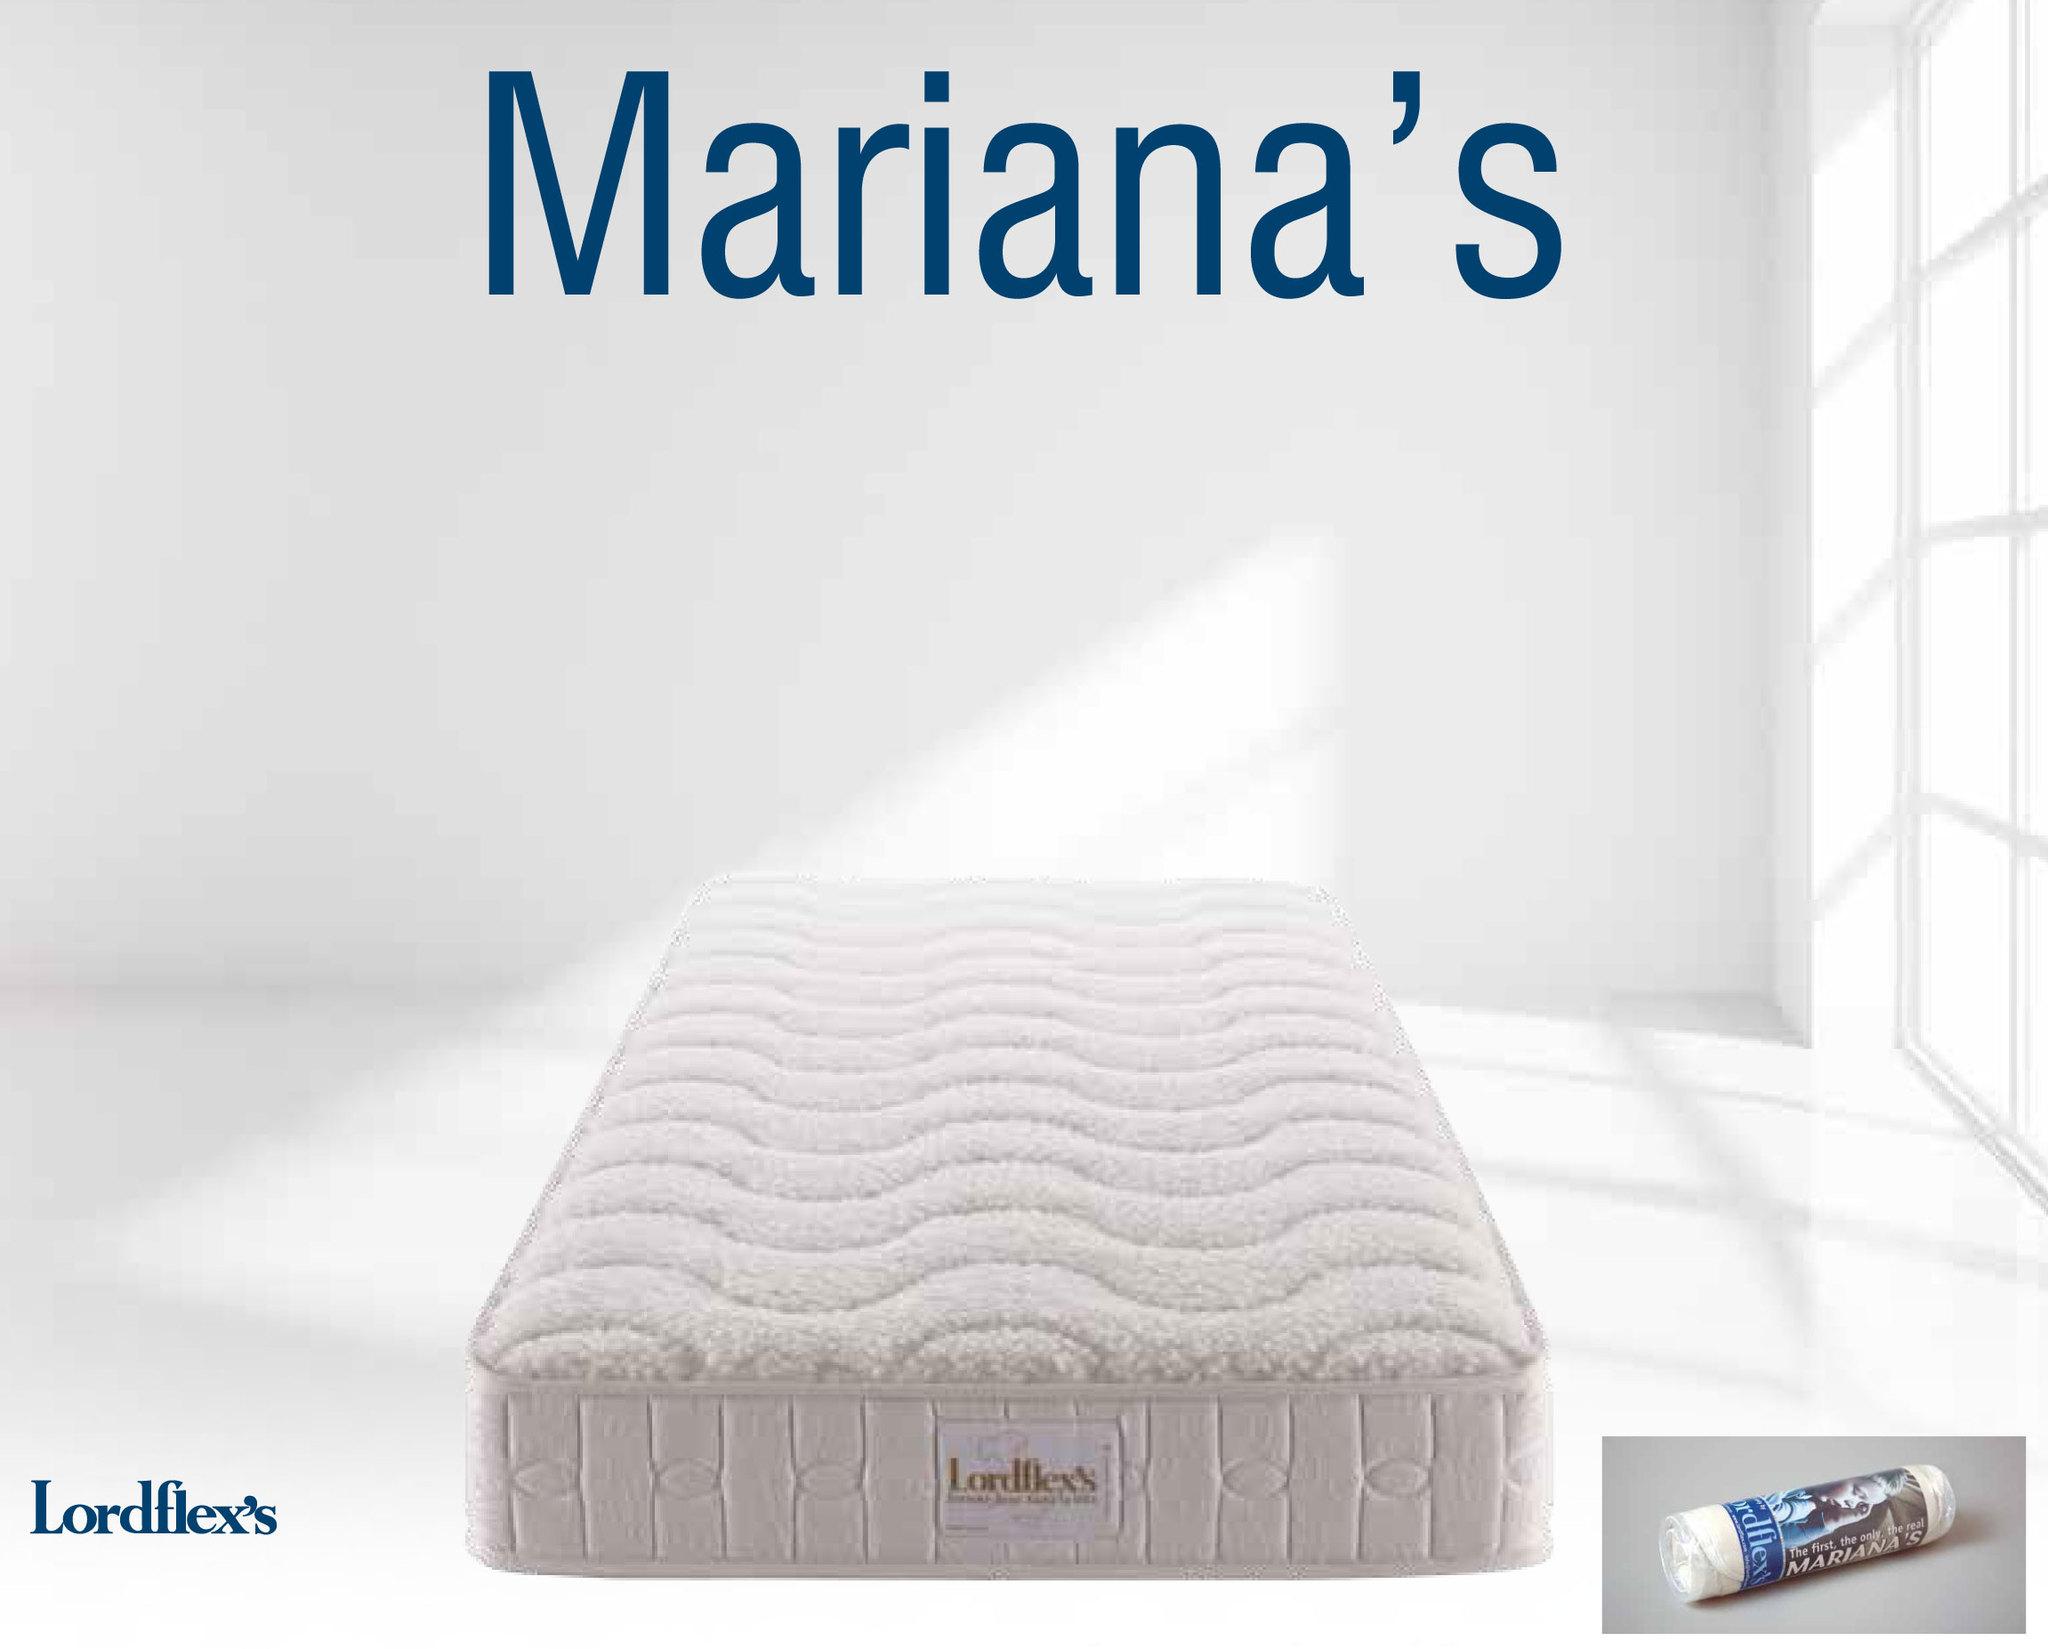 Матрасы Матрас ортопедический Lordflex's Mariana's 80х200 до 140 кг 1_Mariana_s.jpg